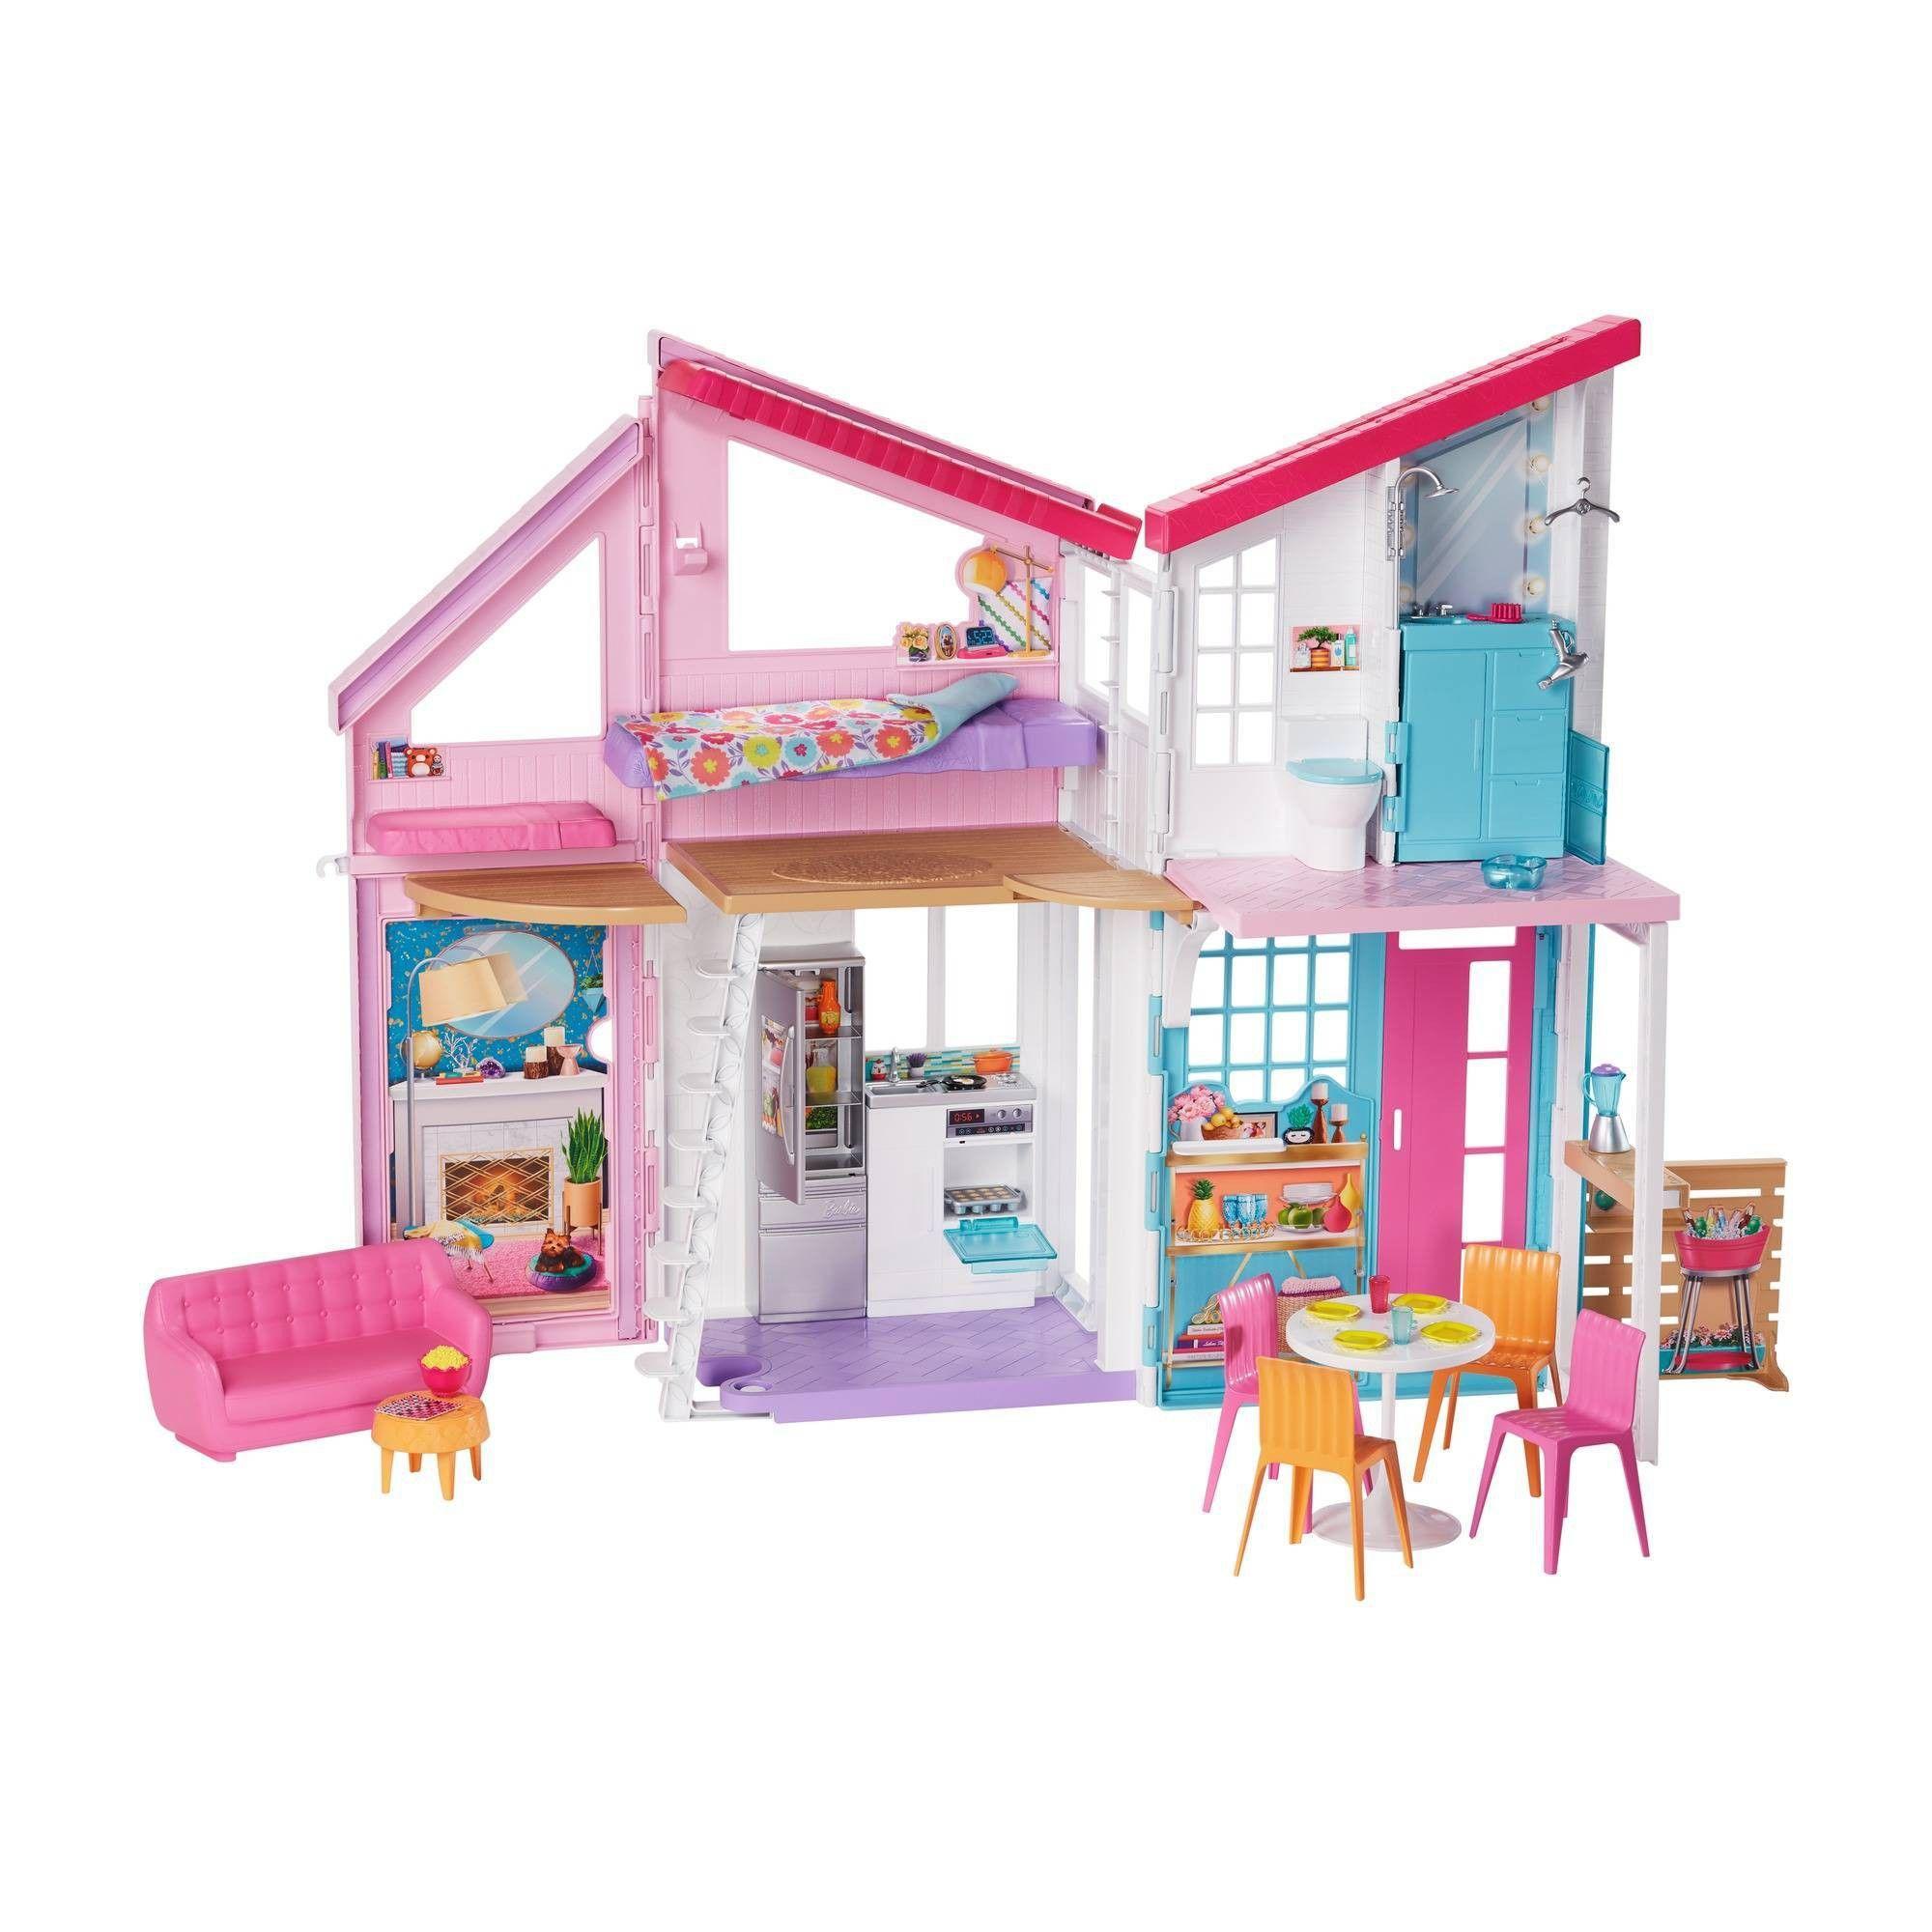 Barbie - Malibu House Playset (FXG57)